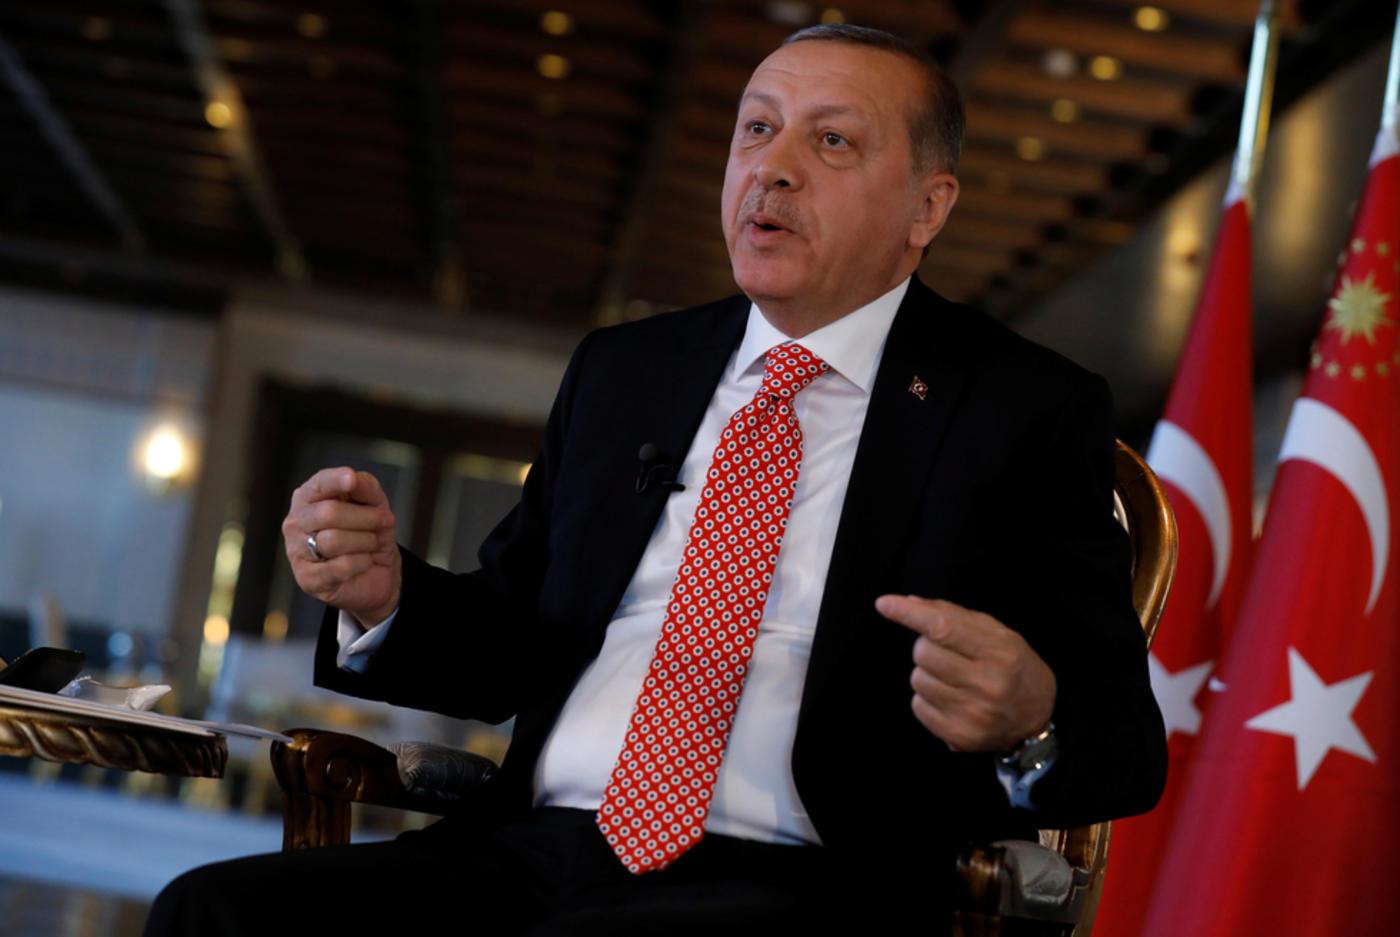 Erdogan says Turkey is ready to walk away from the EU ...